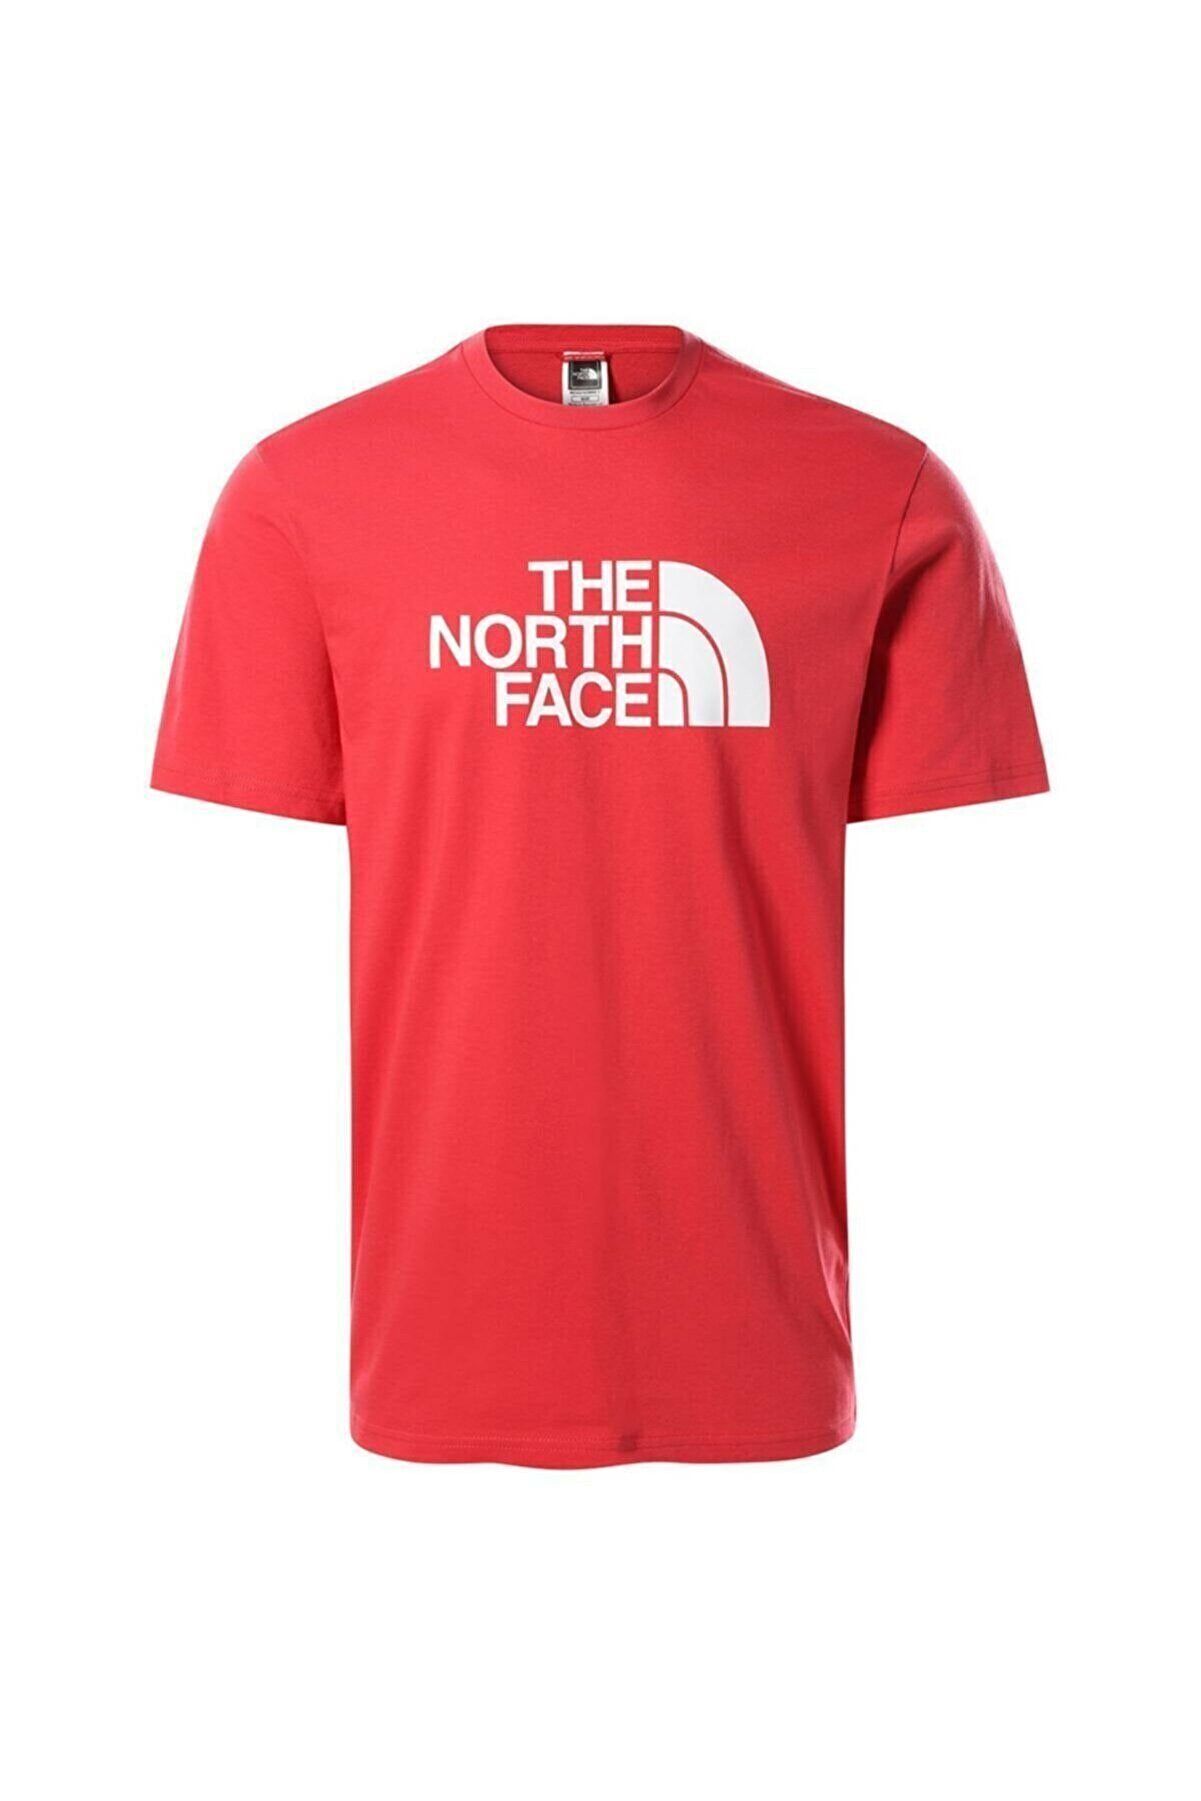 The North Face M S/s Easy Tee - Eu Erkek Kırmızı Tshirt Nf0a2tx3v341